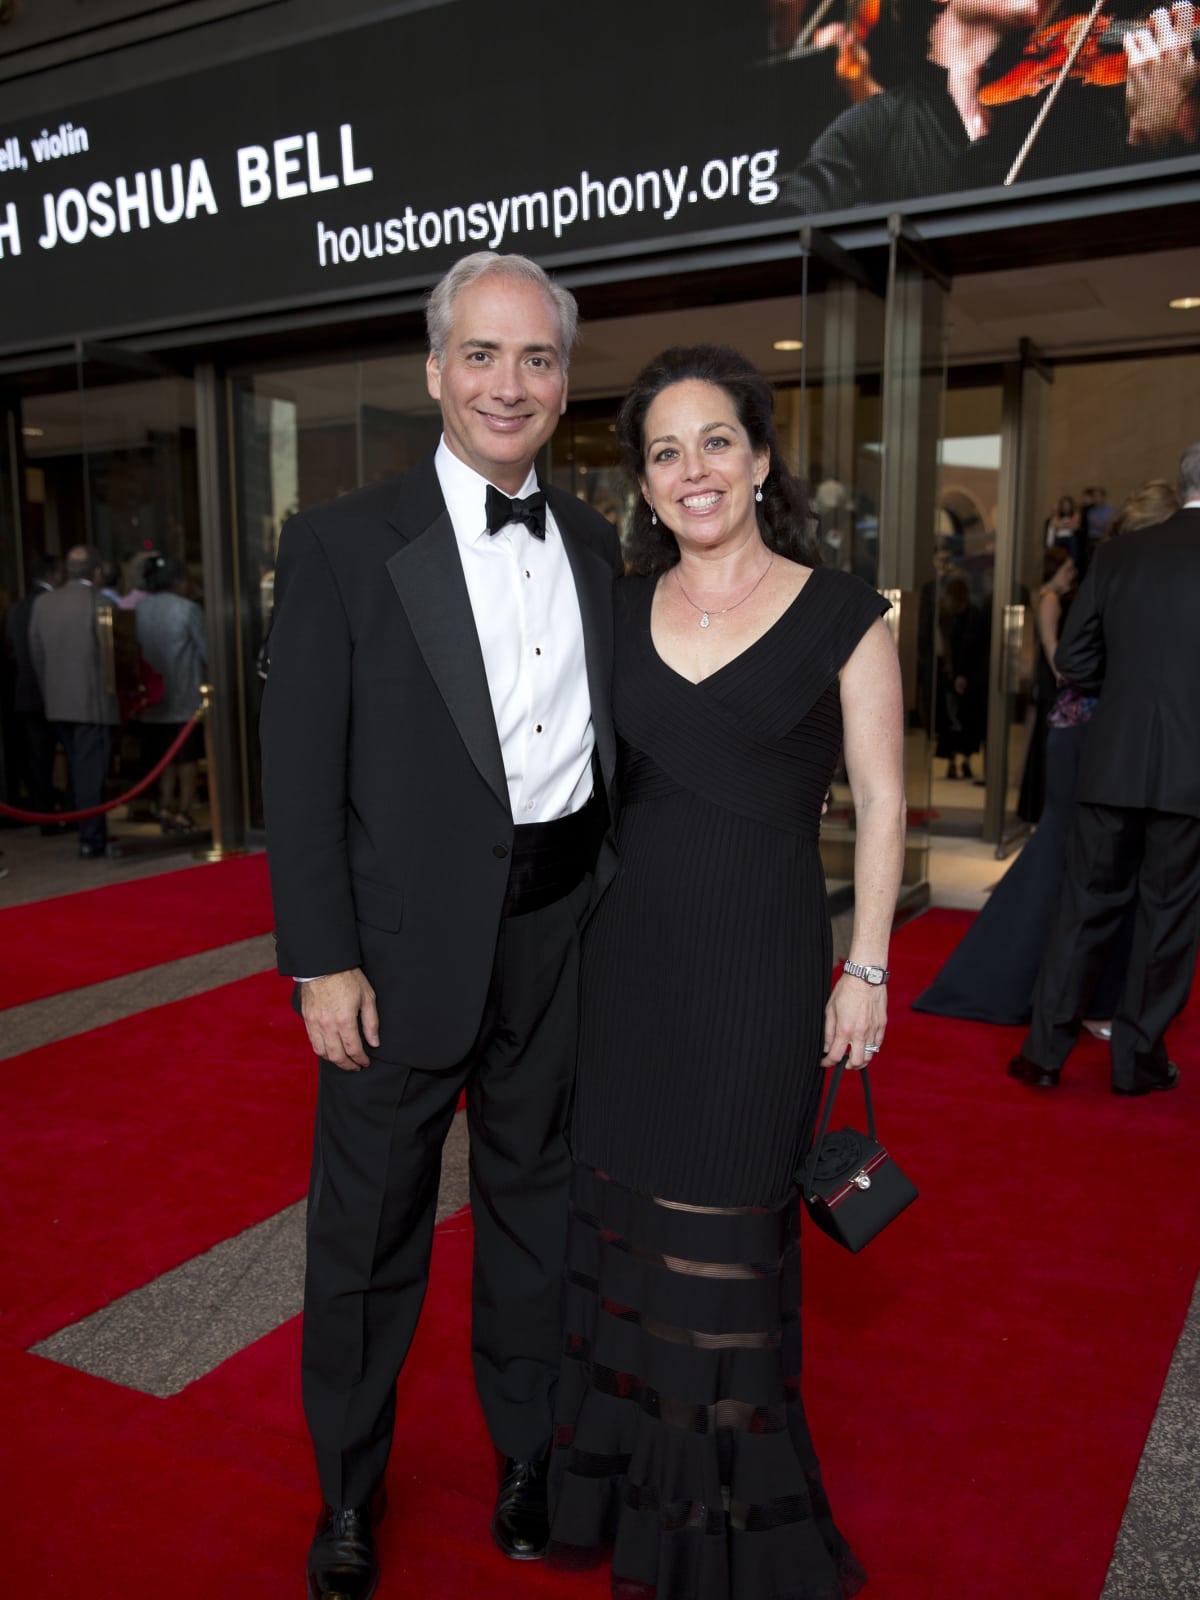 News, Shelby, Houston Symphony Opening Night, Sept. 2015, David Eenechud, Vivian Denechaud